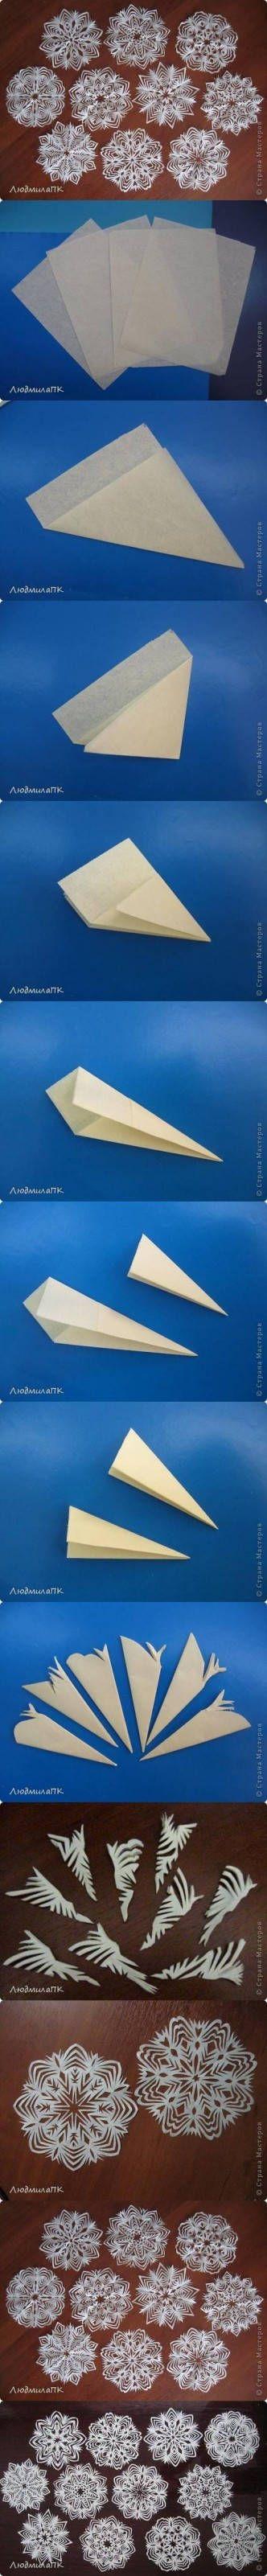 DIY Making Paper Snowflake Method DIY Projects